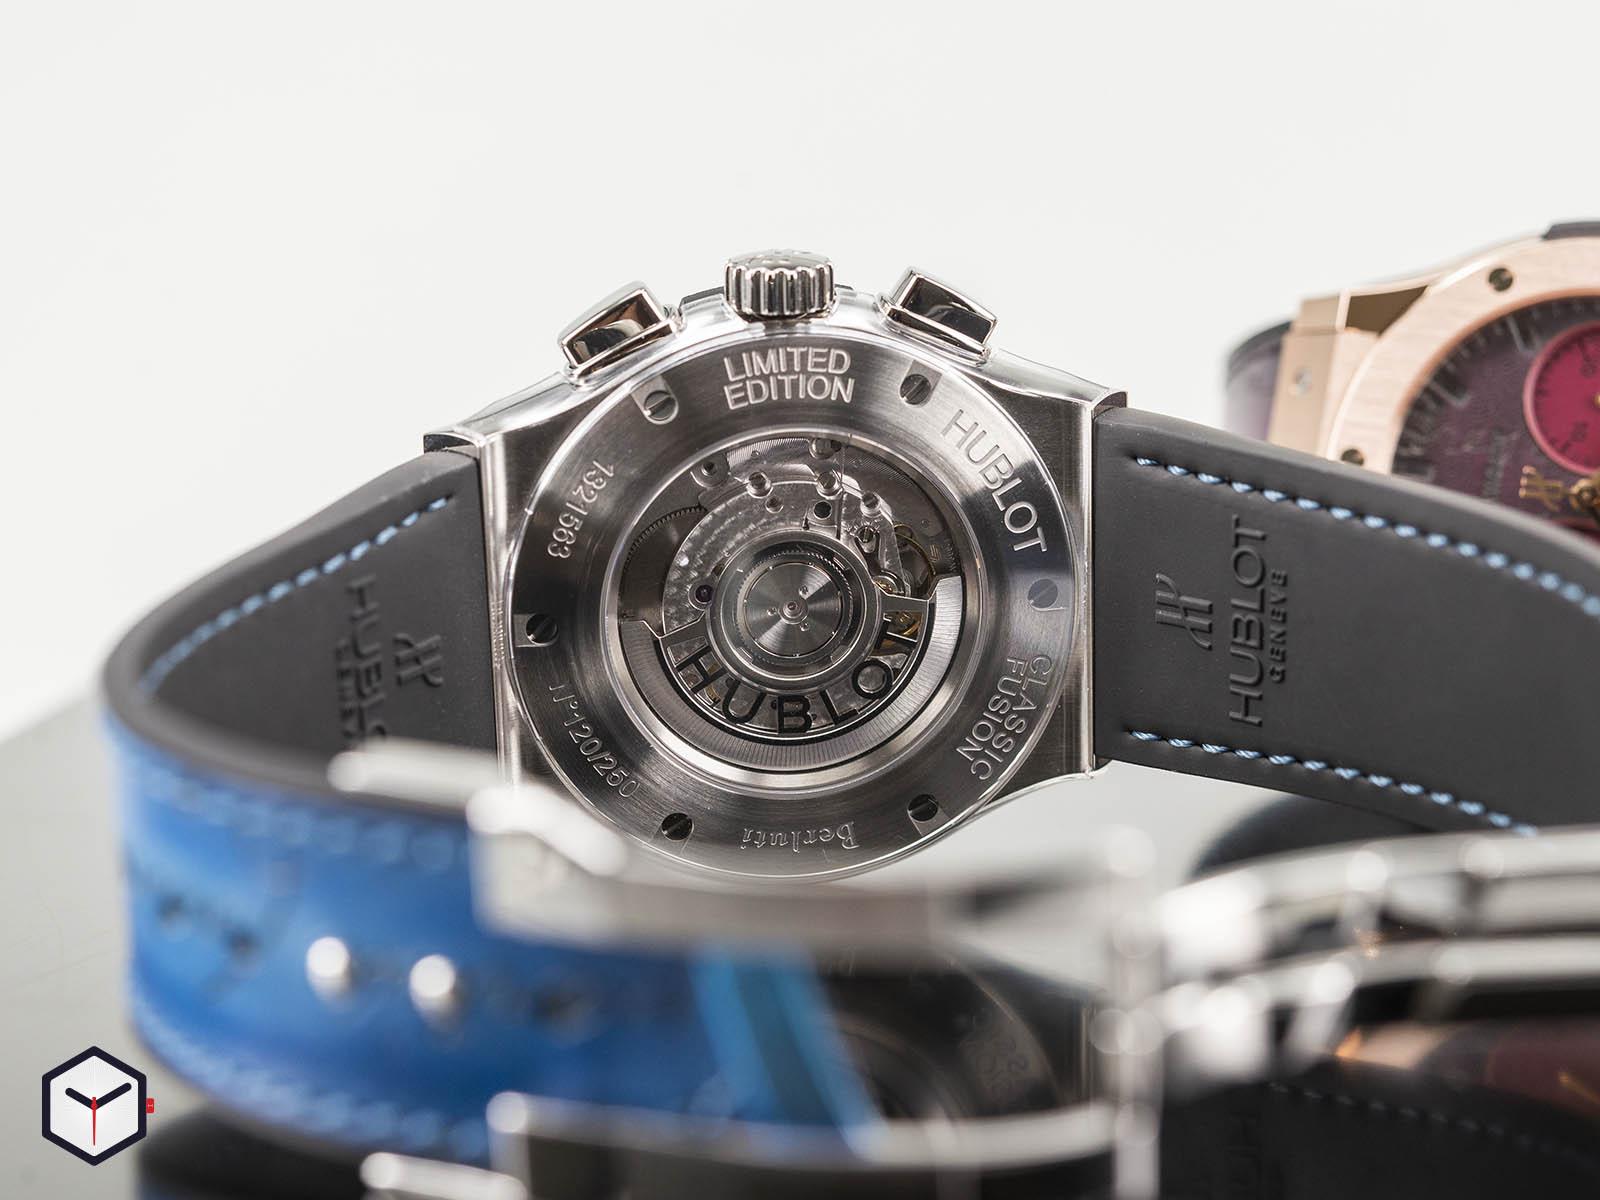 521-nx-050b-vr-ber18-hublot-classic-fusion-chronograph-berluti-scritto-ocean-blue-45mm-9.jpg